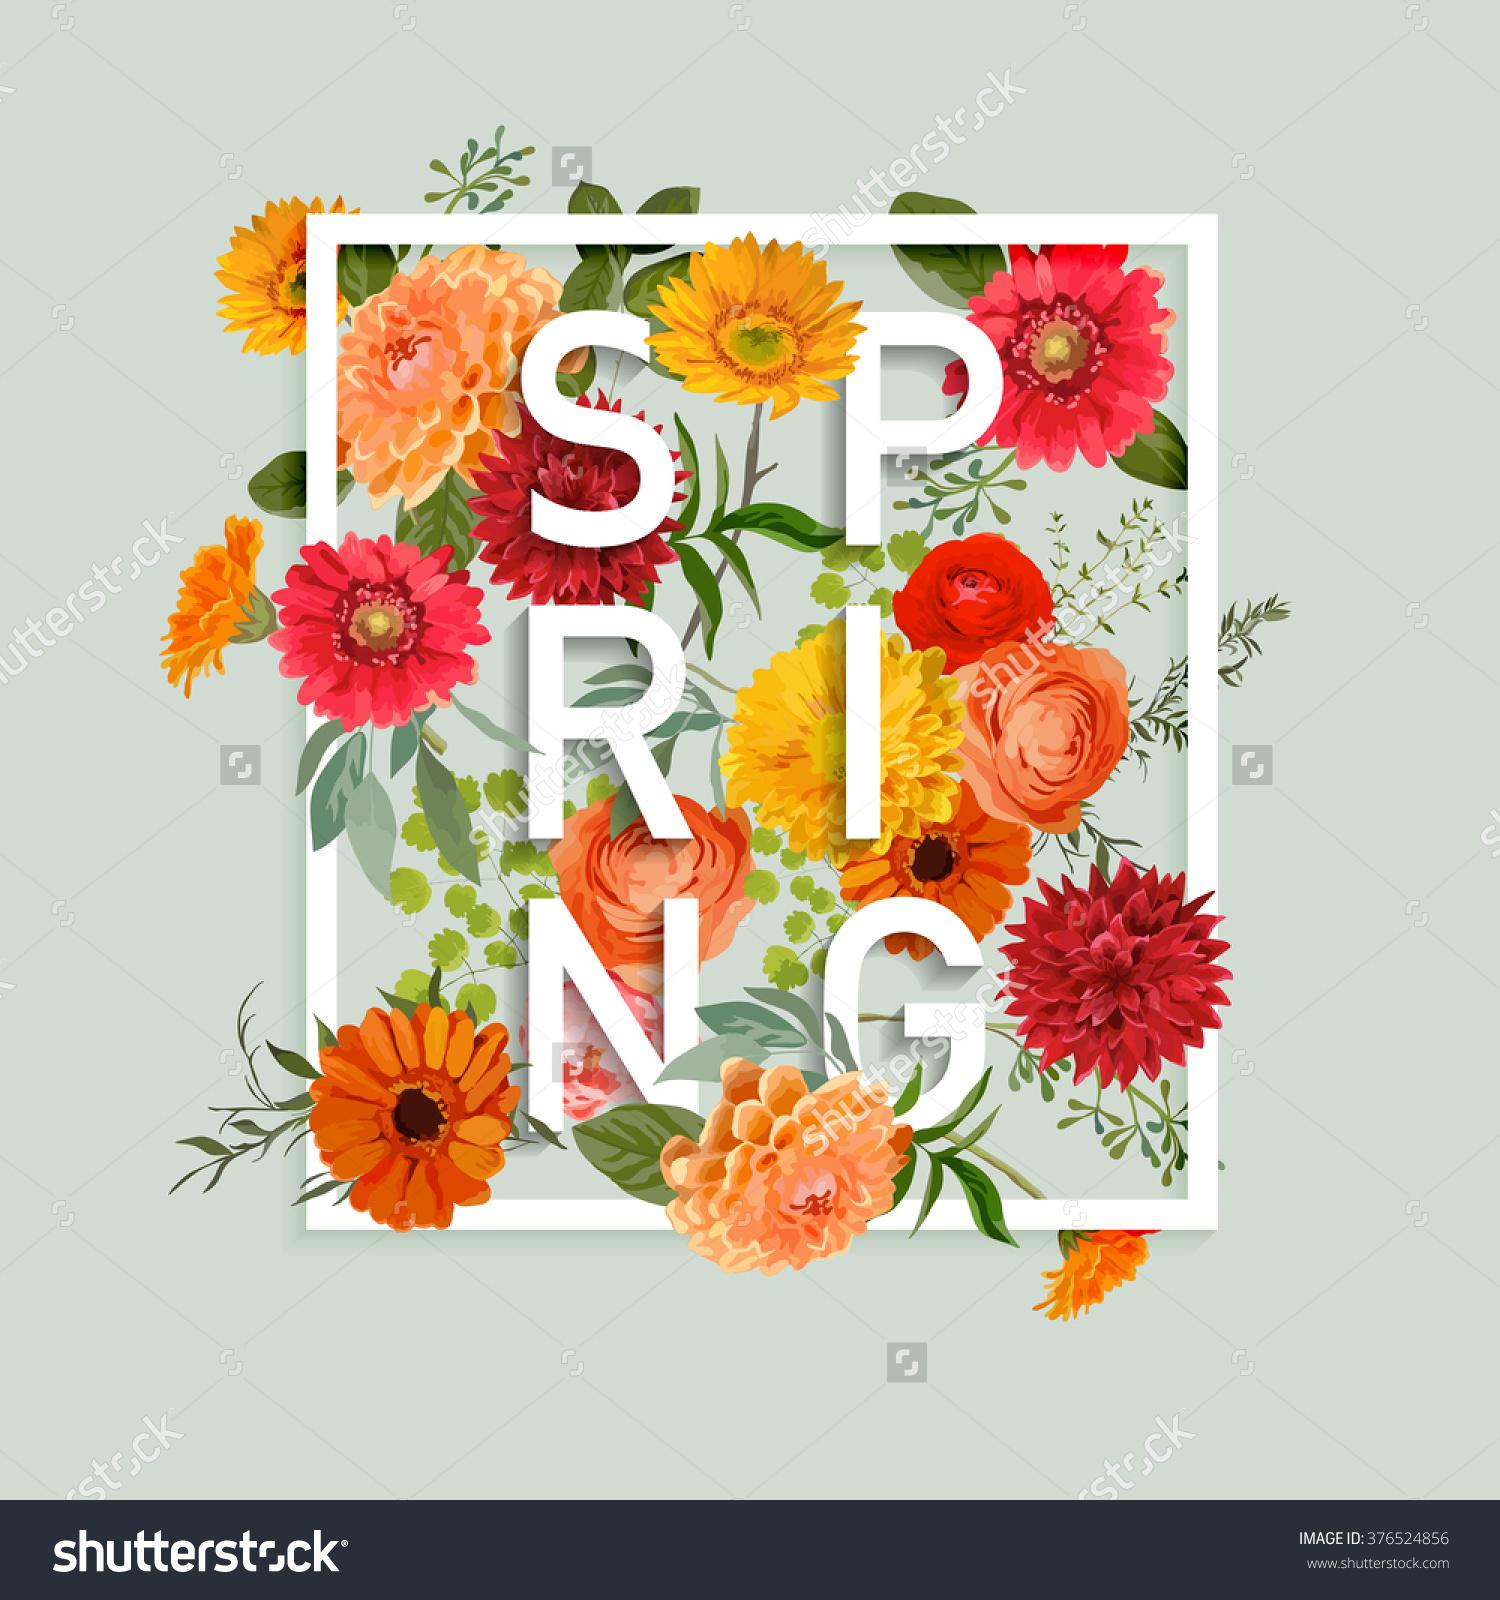 Floral graphic designs banner transparent Floral Spring Graphic Design Colorful Flowers Stock Vector ... banner transparent